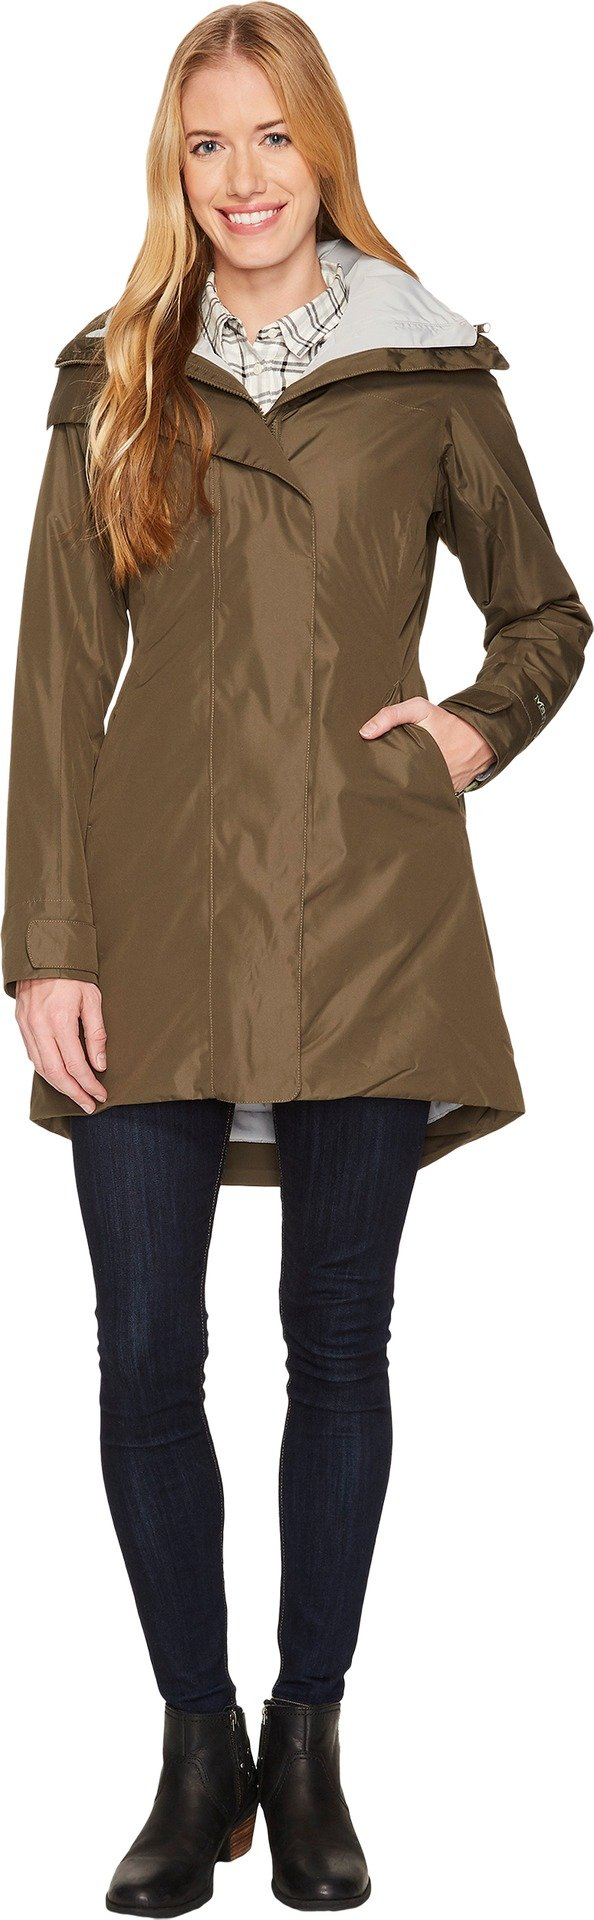 Marmot Women's Downtown Component Jacket Deep Olive Medium